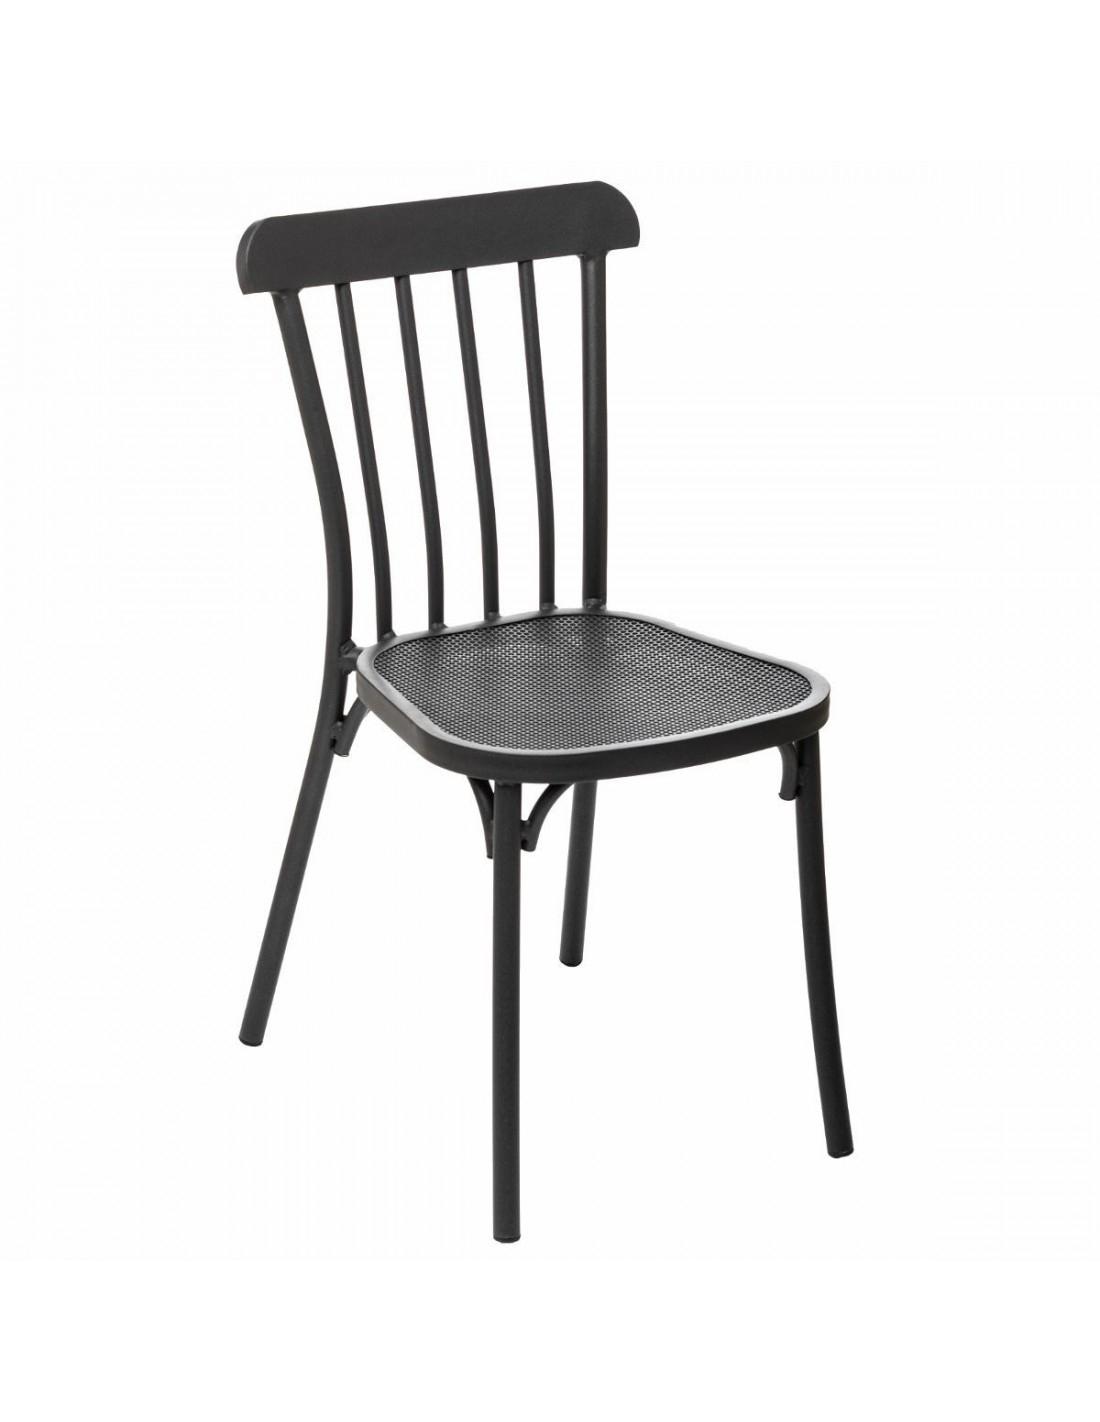 Chaise De Jardin Ellipsa En Aluminium Graphite - Hespéride dedans Chaise Hesperide